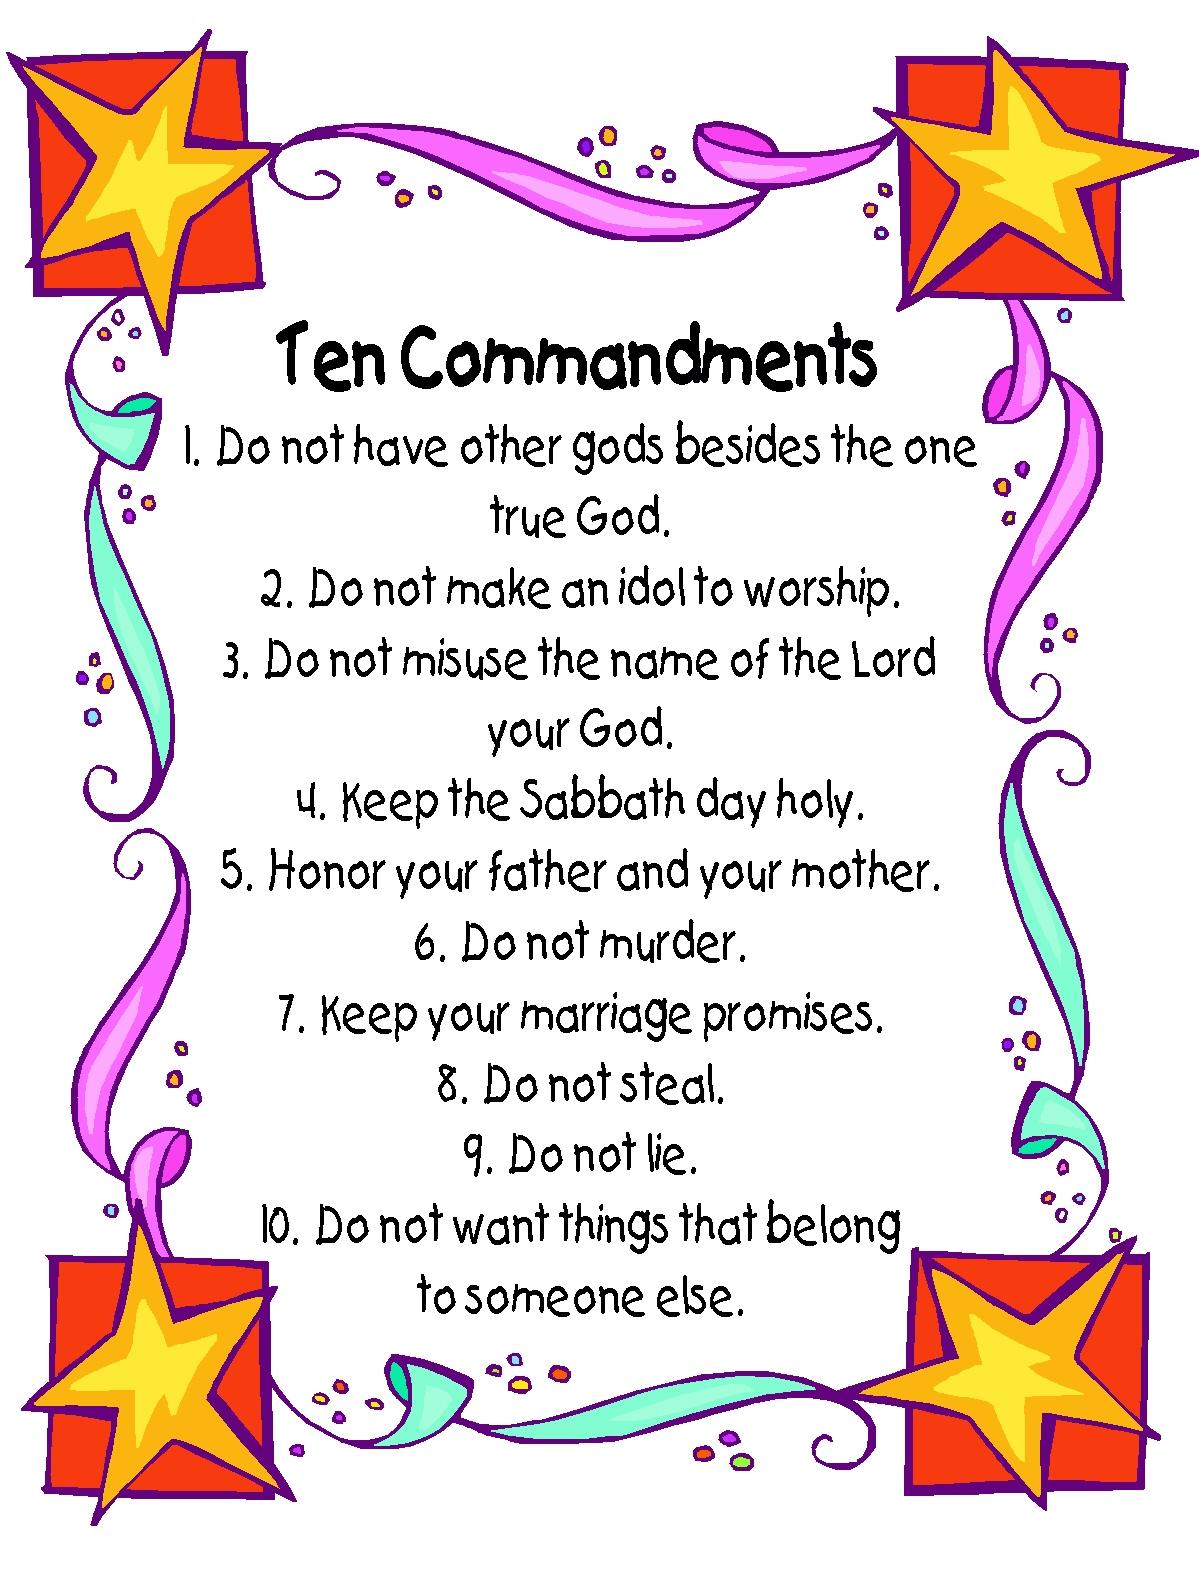 photo regarding 10 Commandments Poster Printable named 10 Commandments Poster absolutely free printable child welcoming